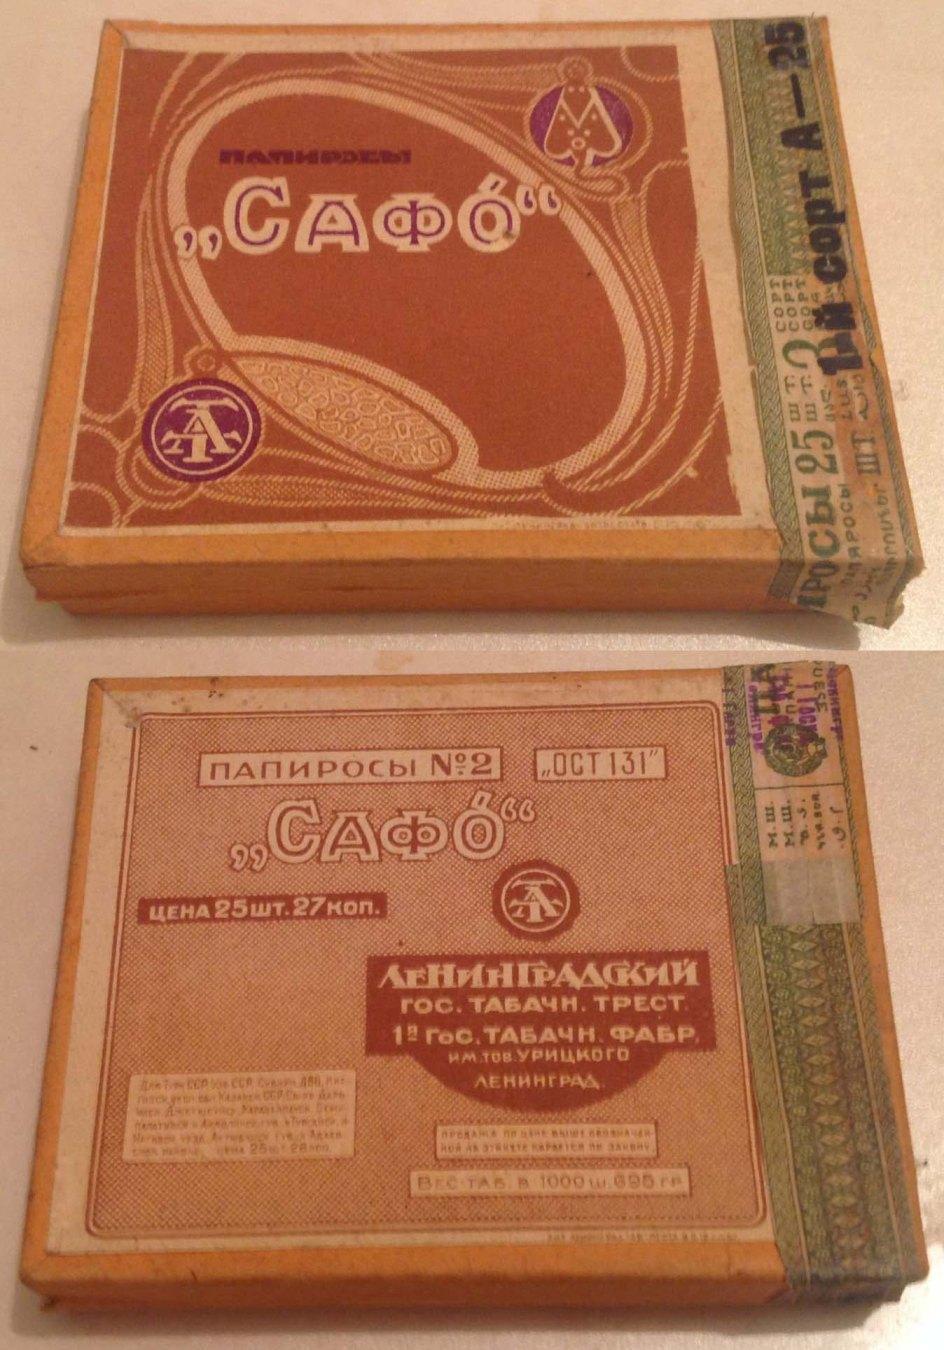 Папиросы Сафо